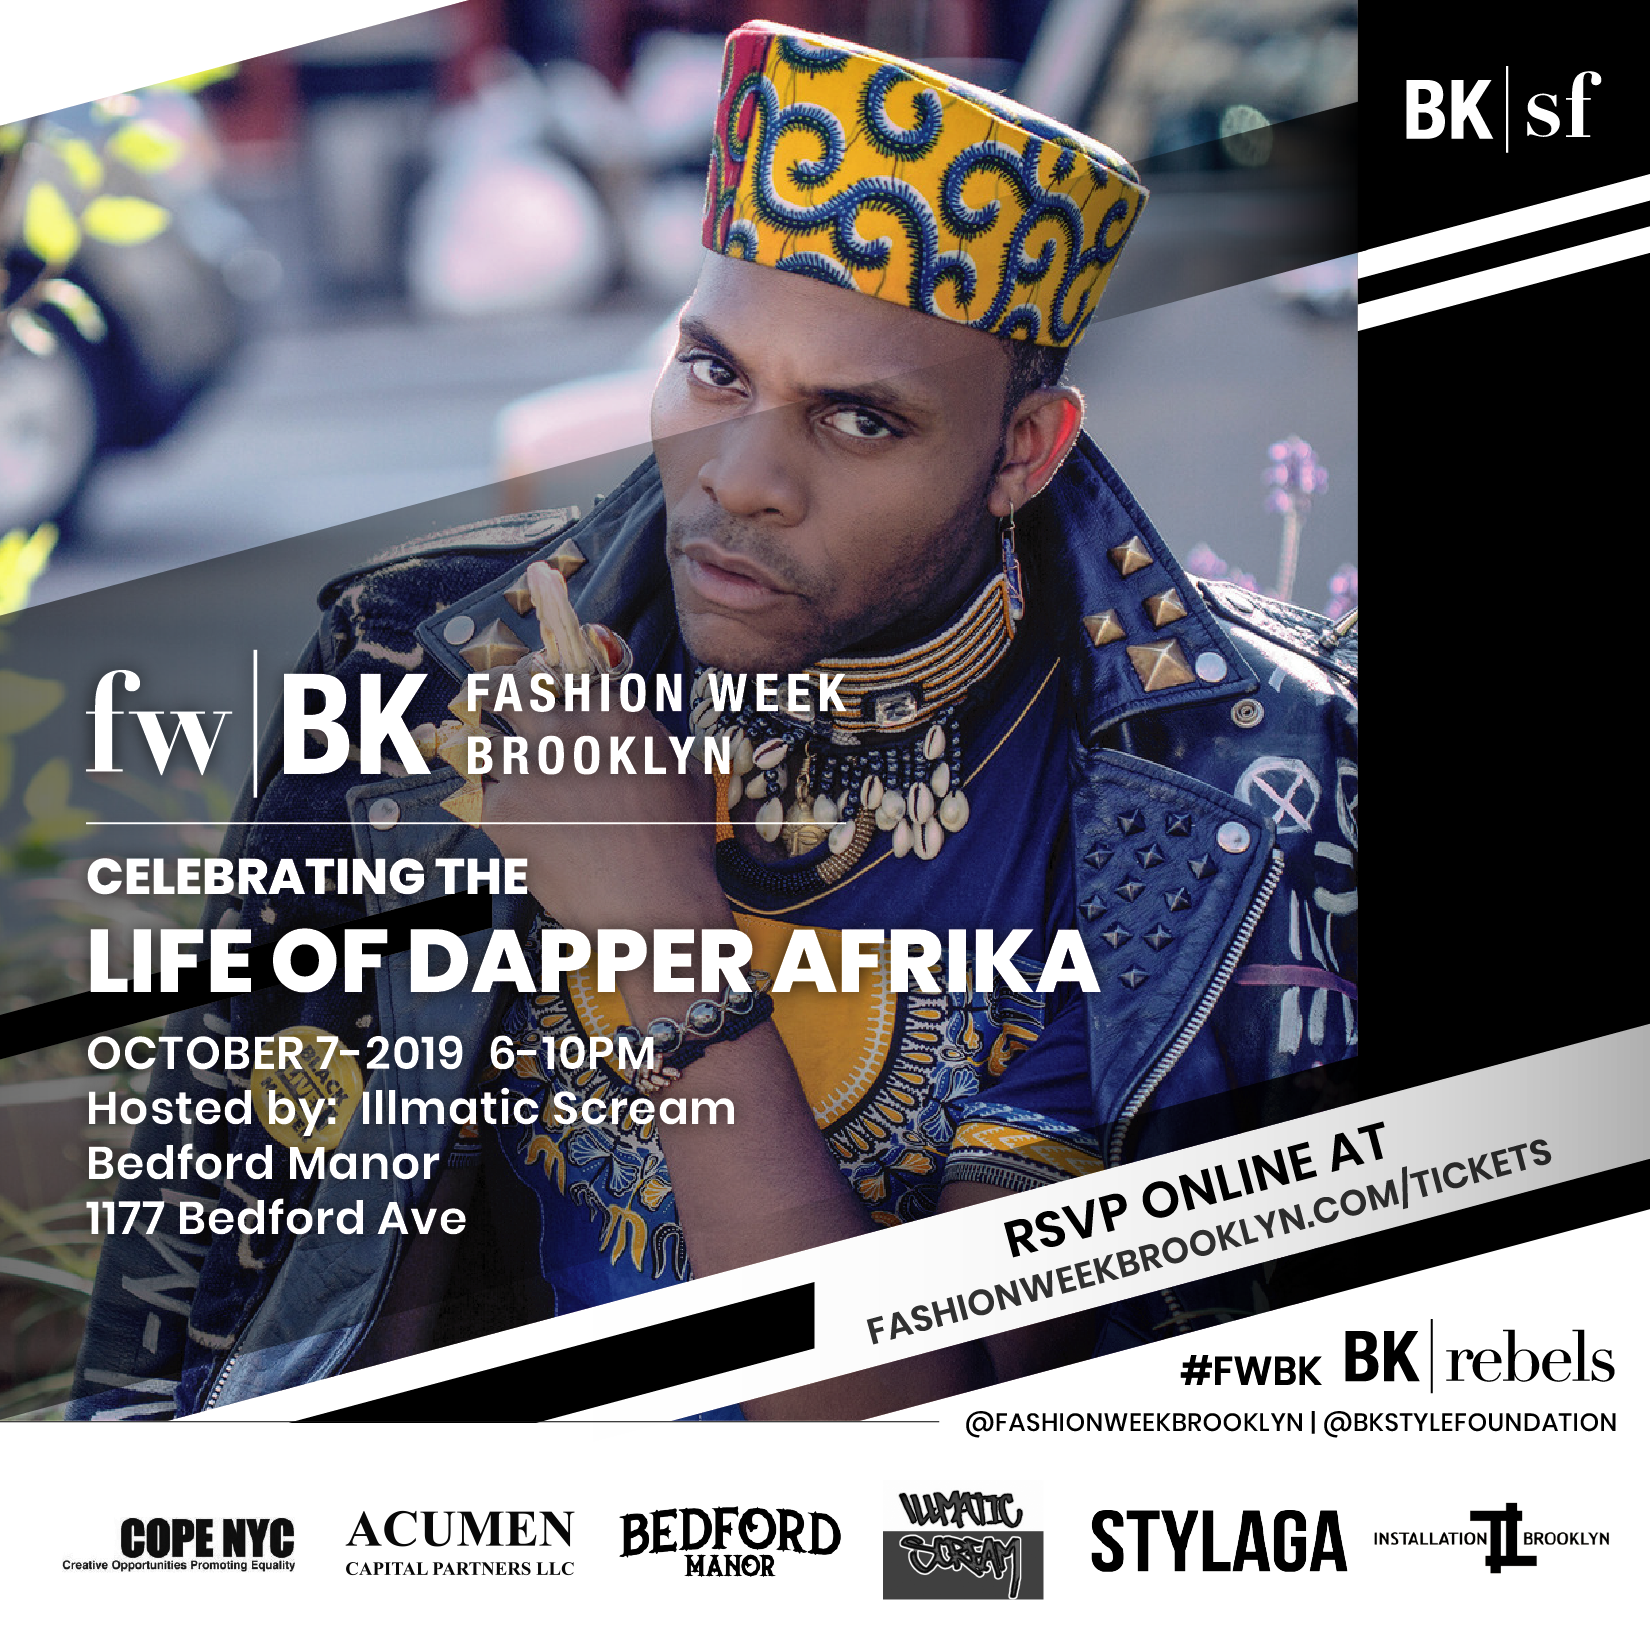 Celebrating life of Dapper Afrika